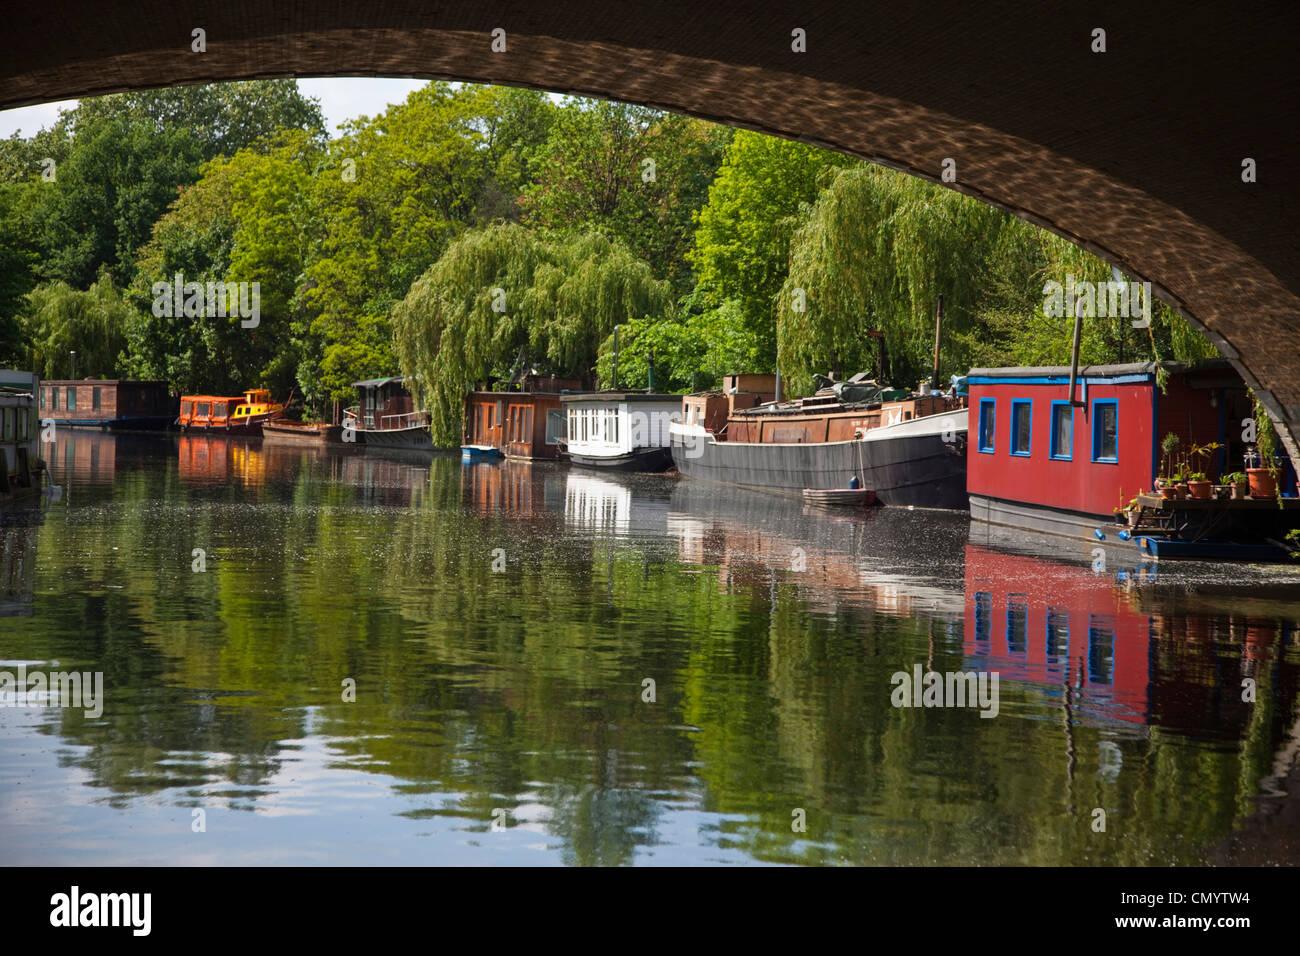 house boats in Tiergarten, Berlin, Germany - Stock Image